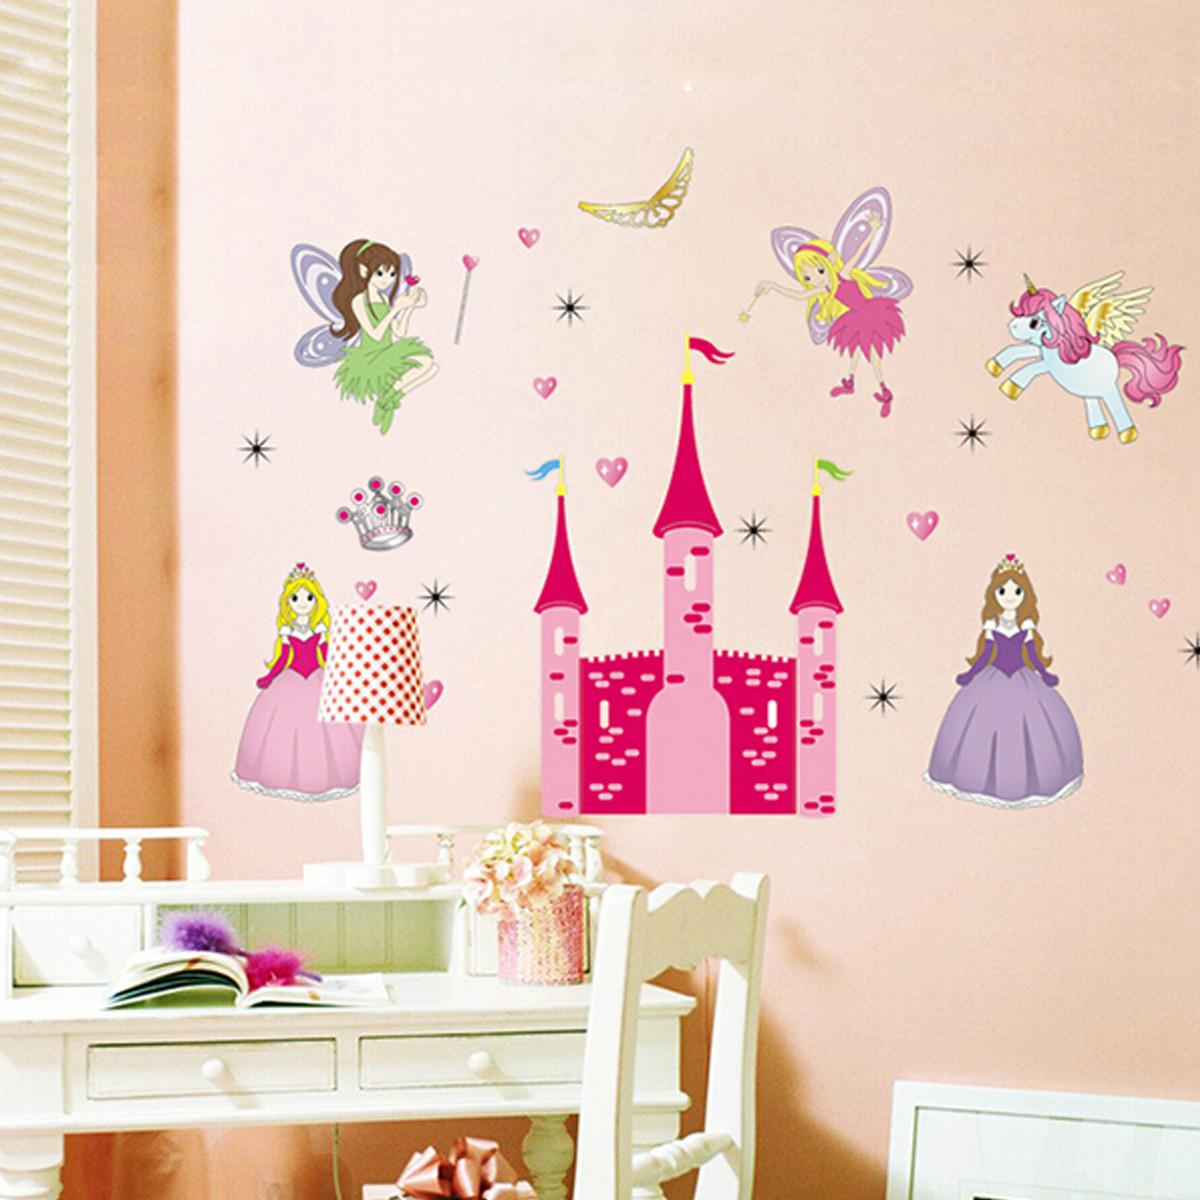 Removable vinyl mural wall sticker fairy princess castle for Cuartos para ninas decorados